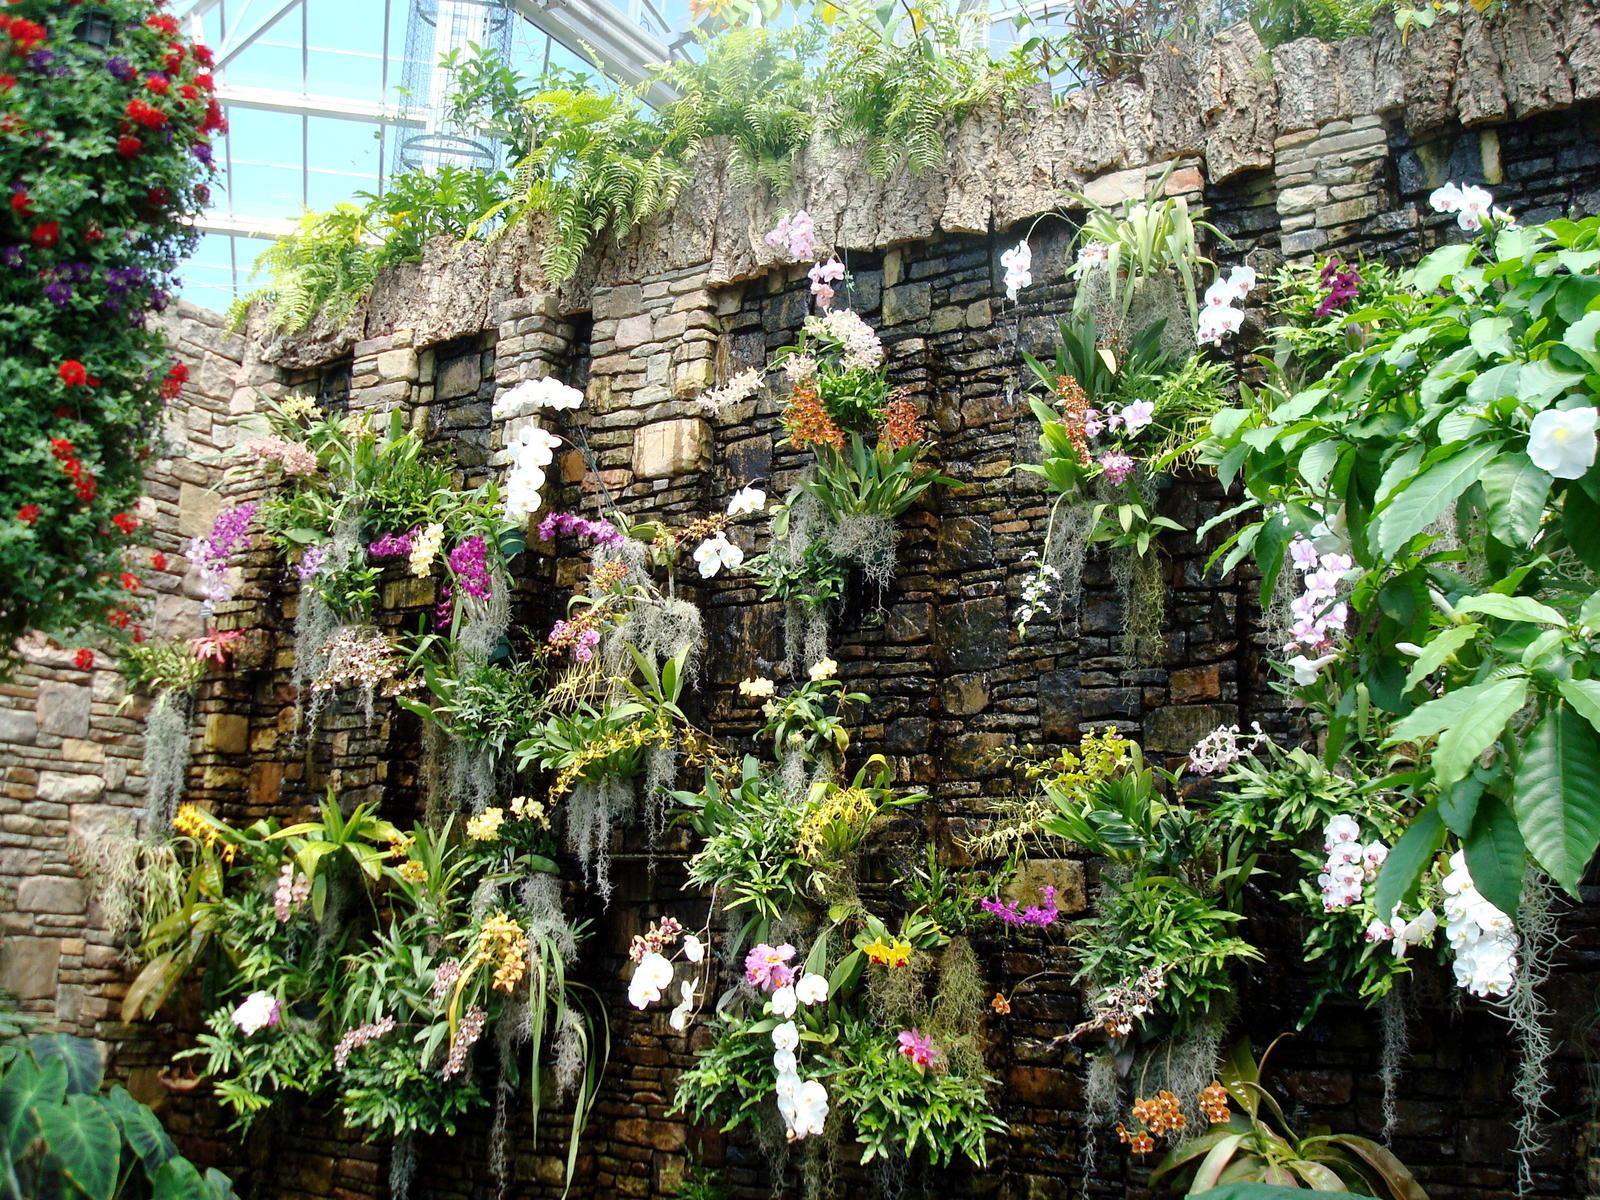 daniel stowe botanical garden charlotte appointed house landscaping north carolina nc